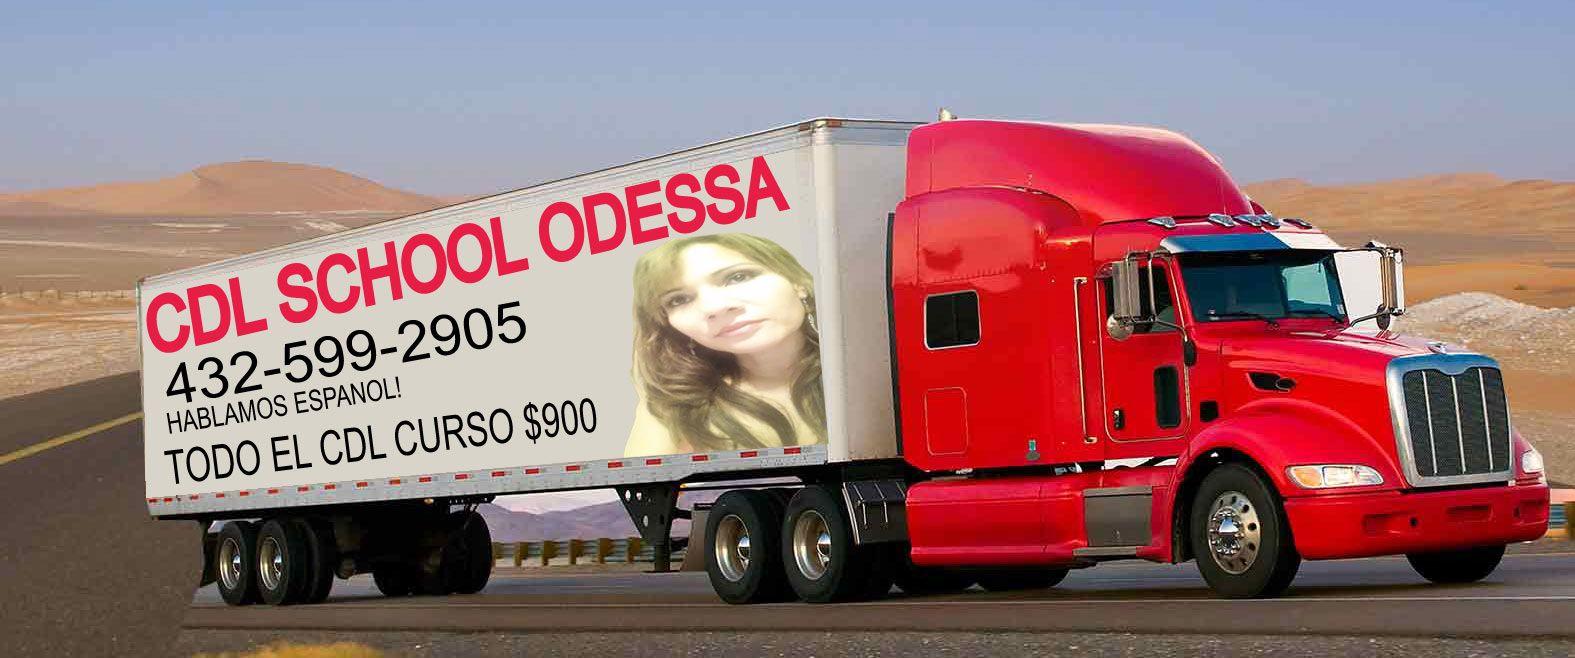 Cdl school san antonio low price cdl school 623 792 0017